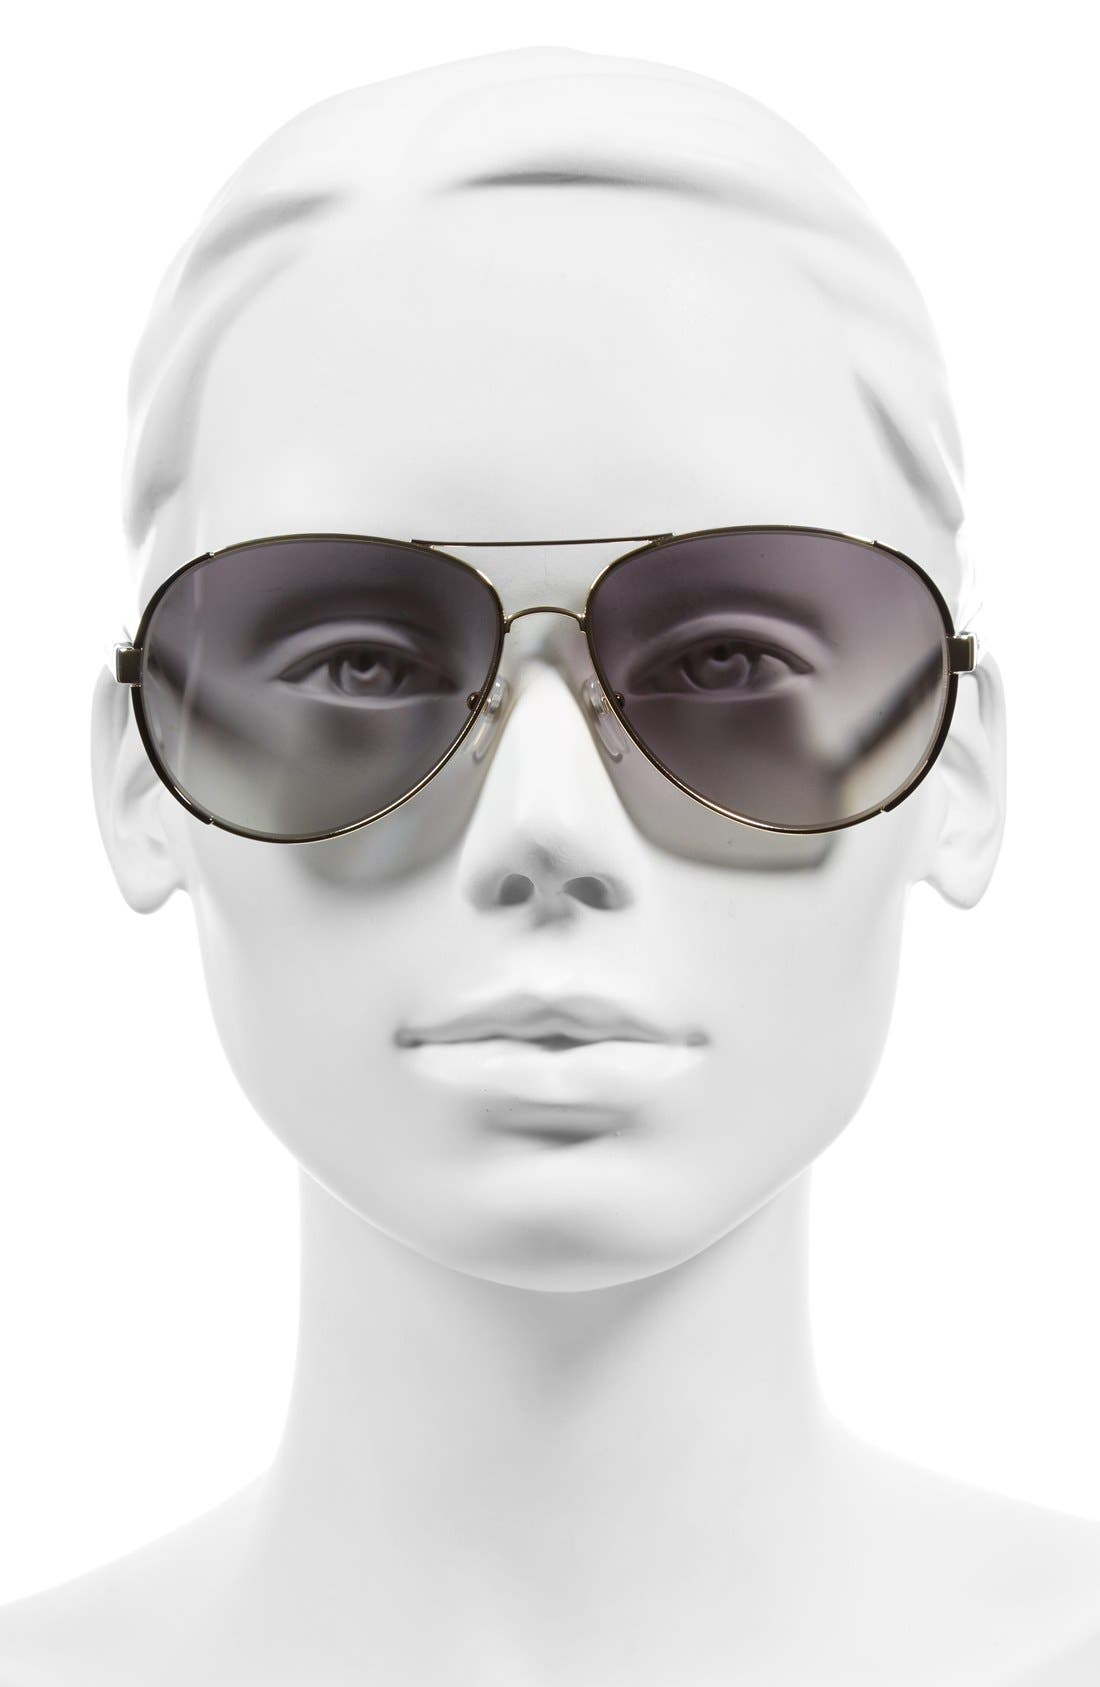 60mm Oversize Aviator Sunglasses,                             Alternate thumbnail 2, color,                             712